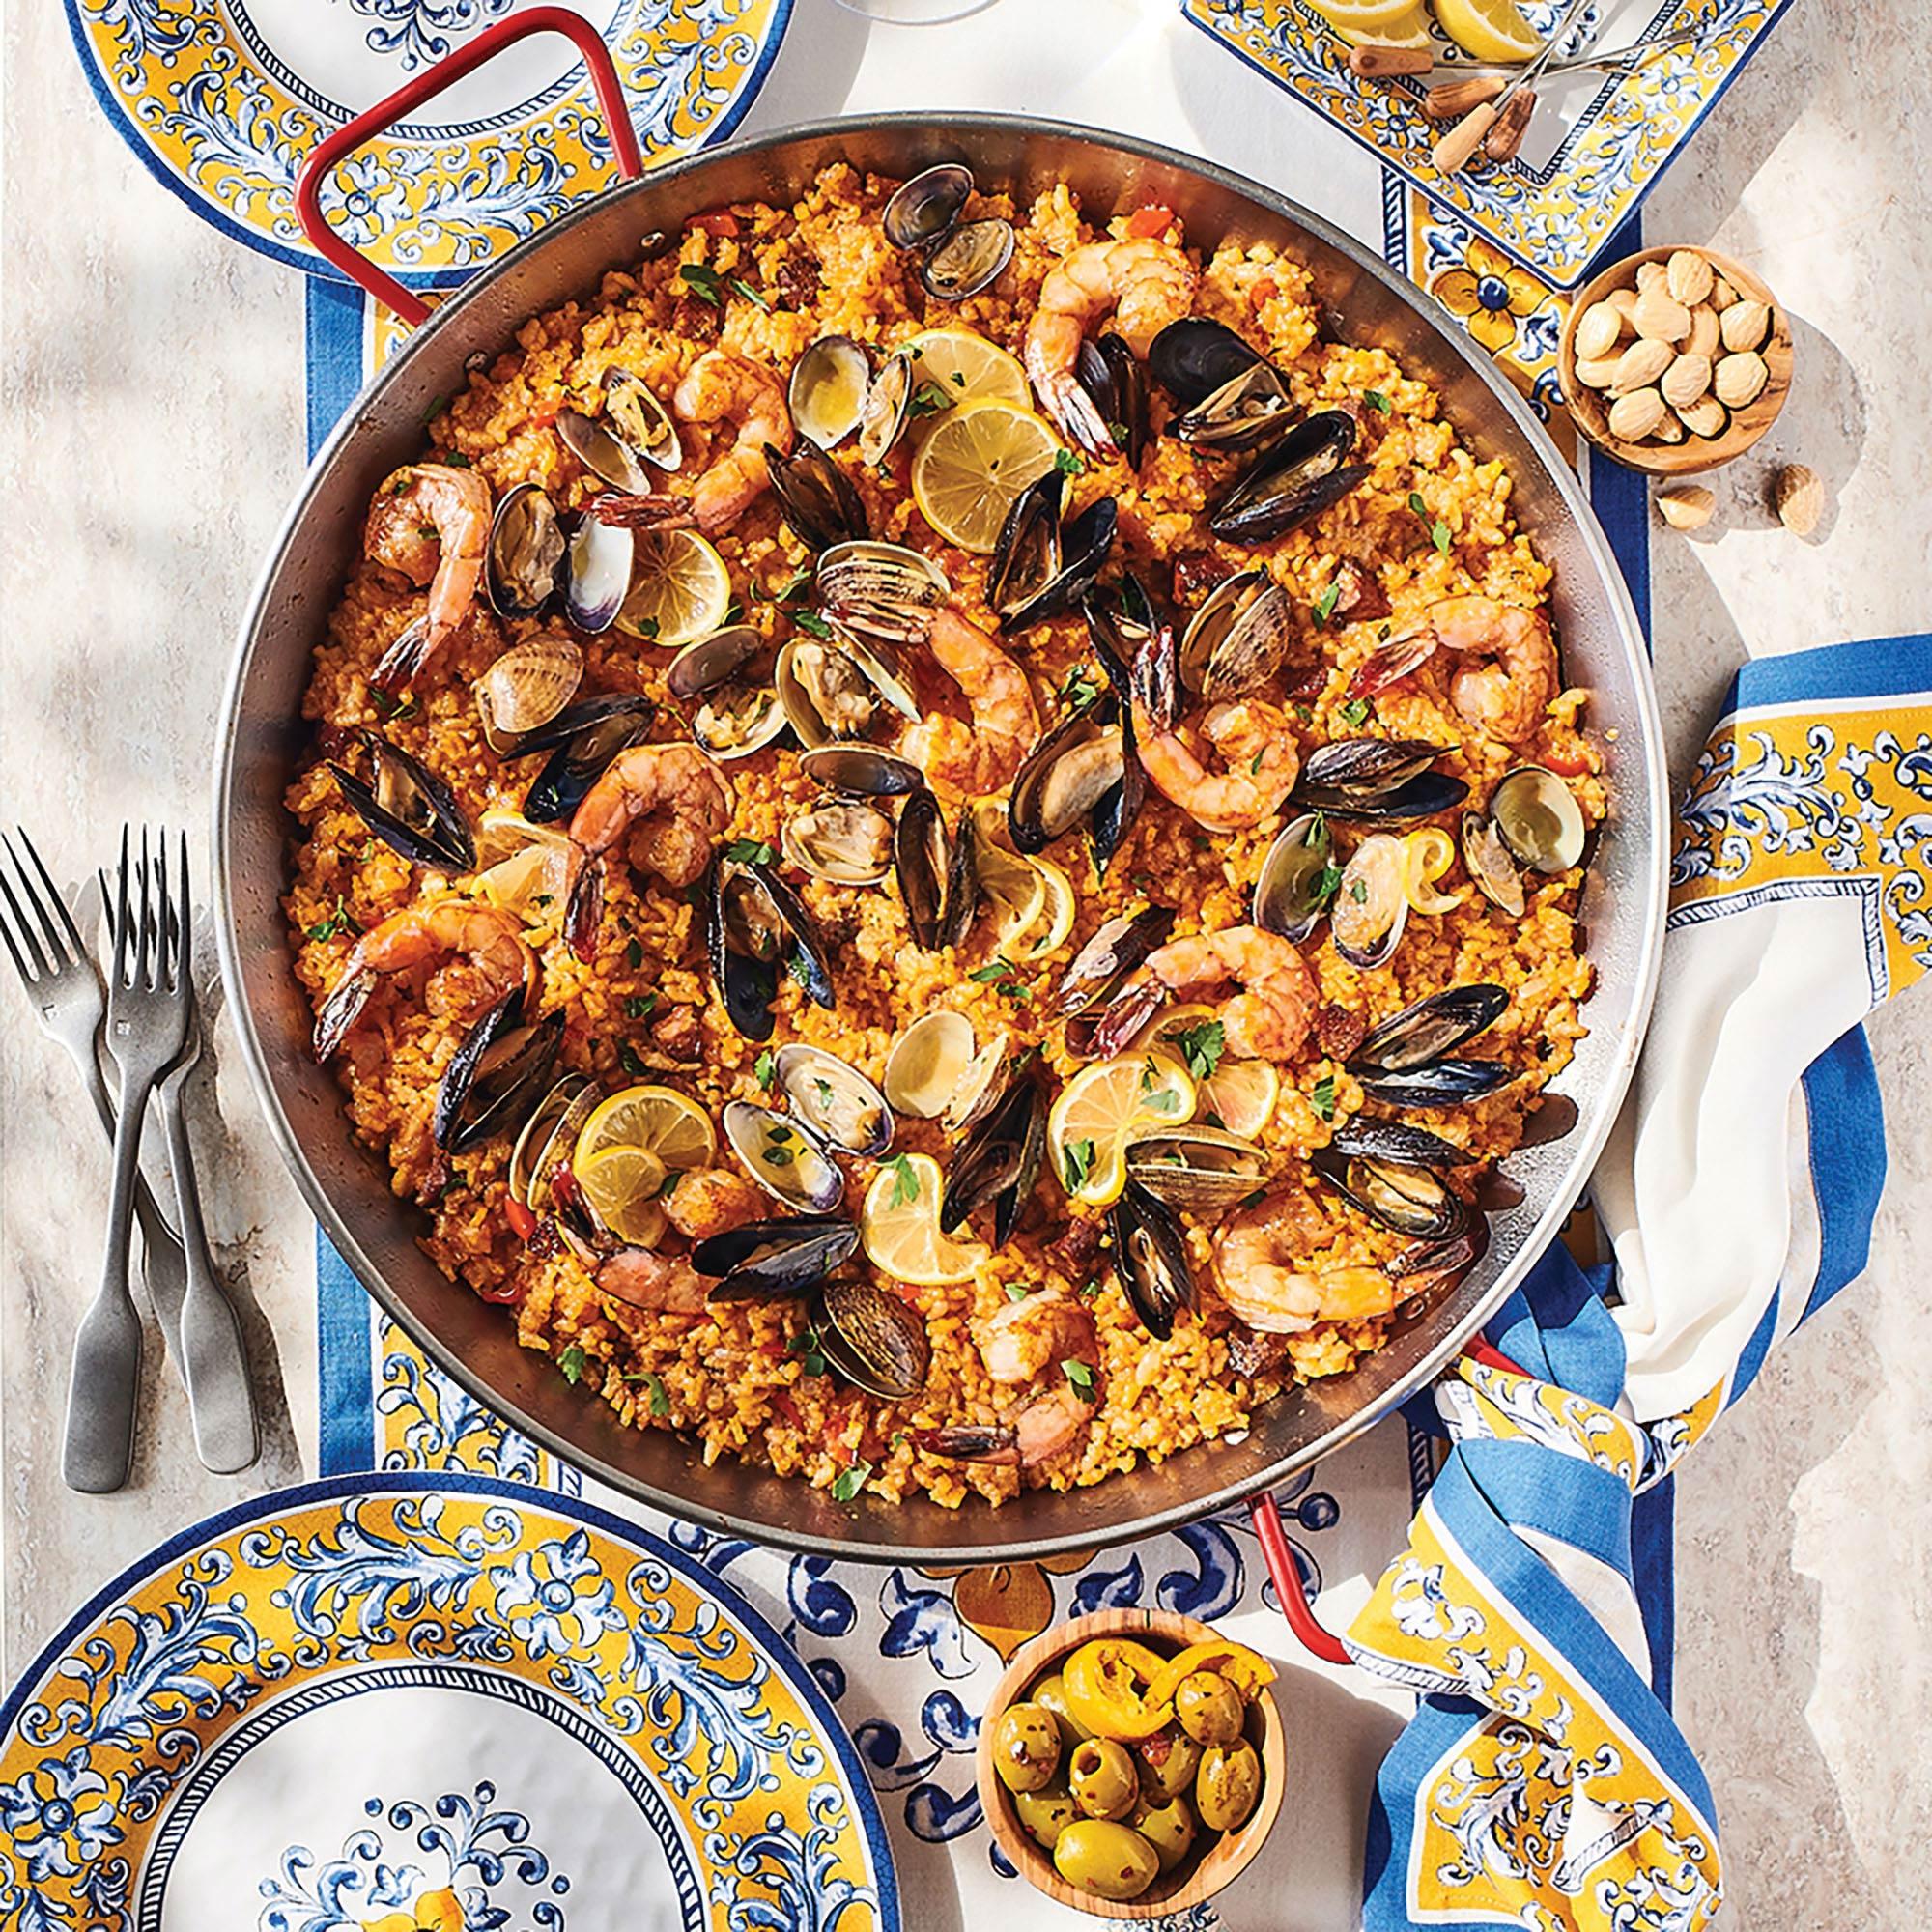 Slt506659 paella recipe detail 292 1500px